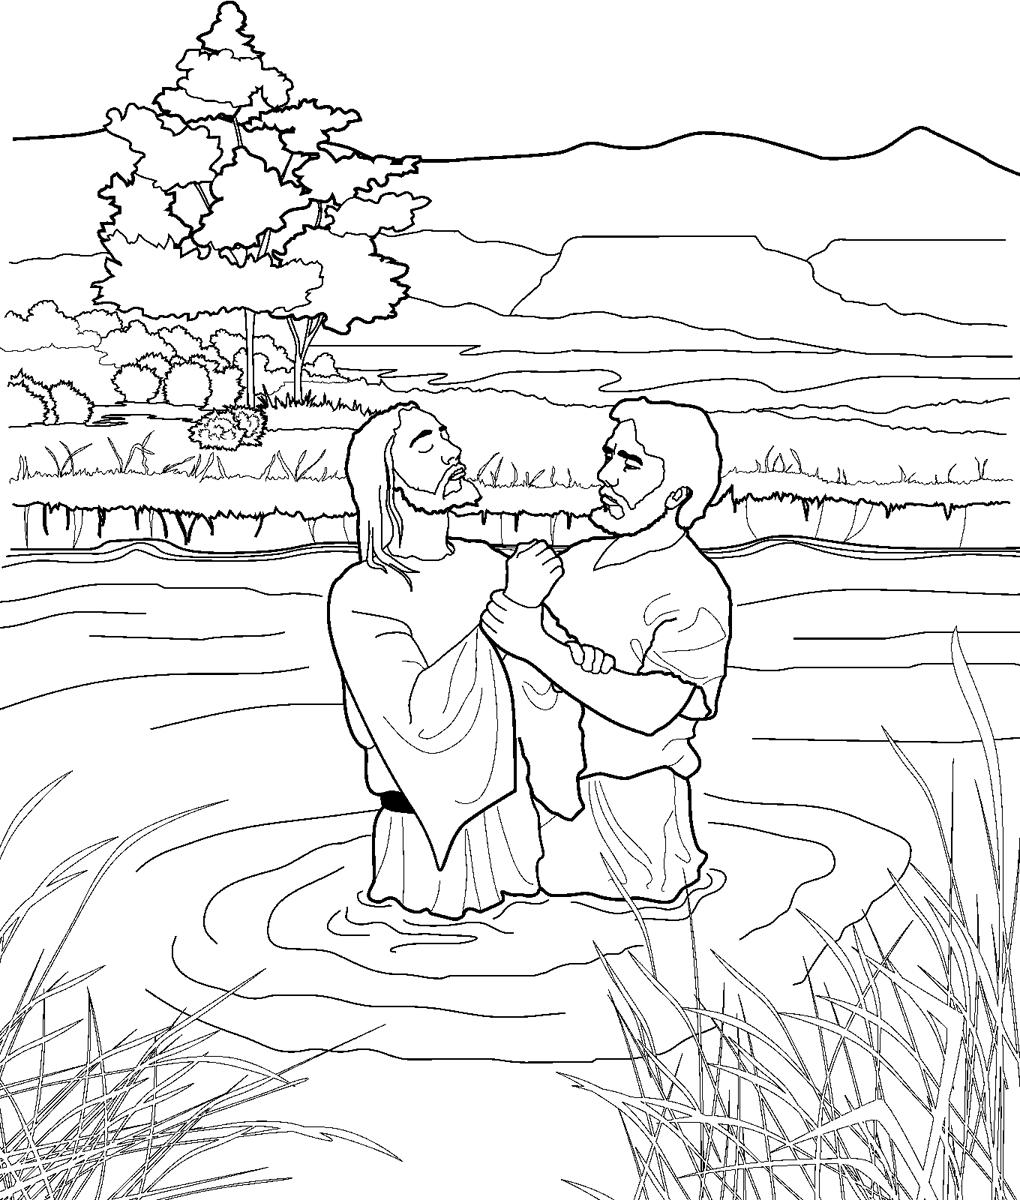 john baptizes jesus coloring page 60 best images about john the baptist on pinterest saint page jesus coloring john baptizes